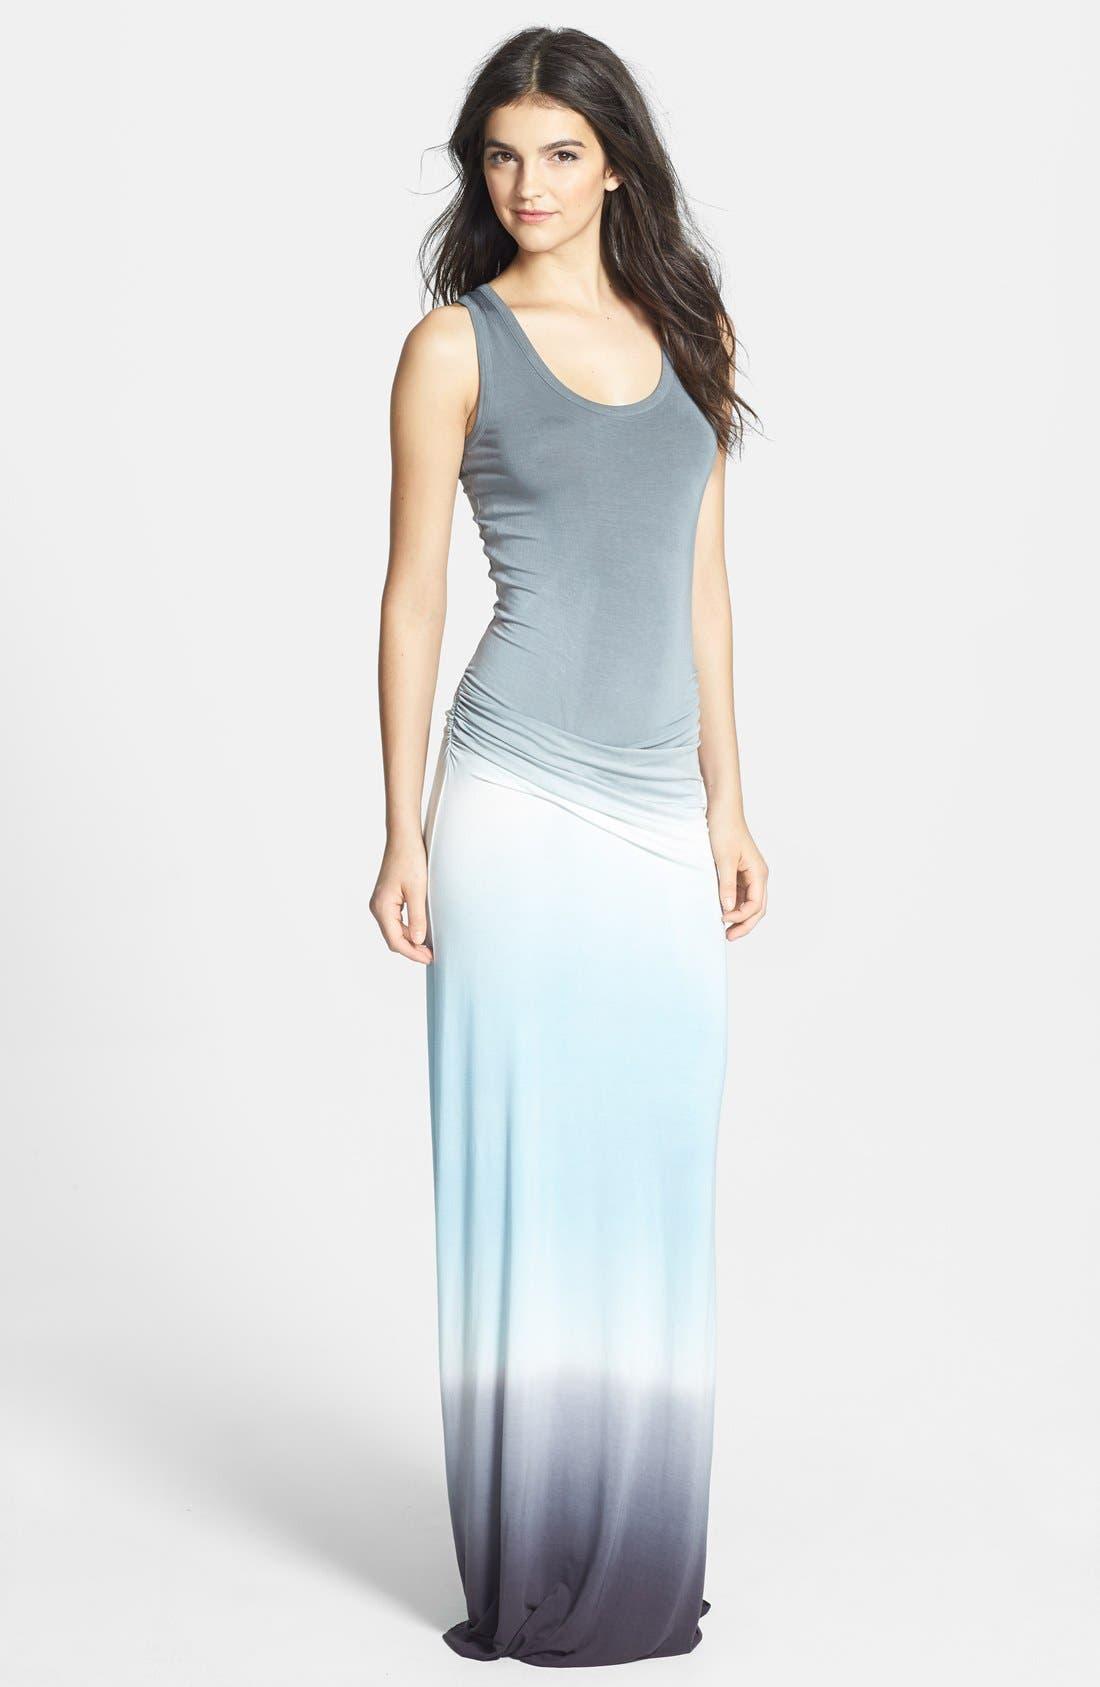 Alternate Image 1 Selected - Young, Fabulous & Broke 'Hamptons' Racerback Maxi Dress